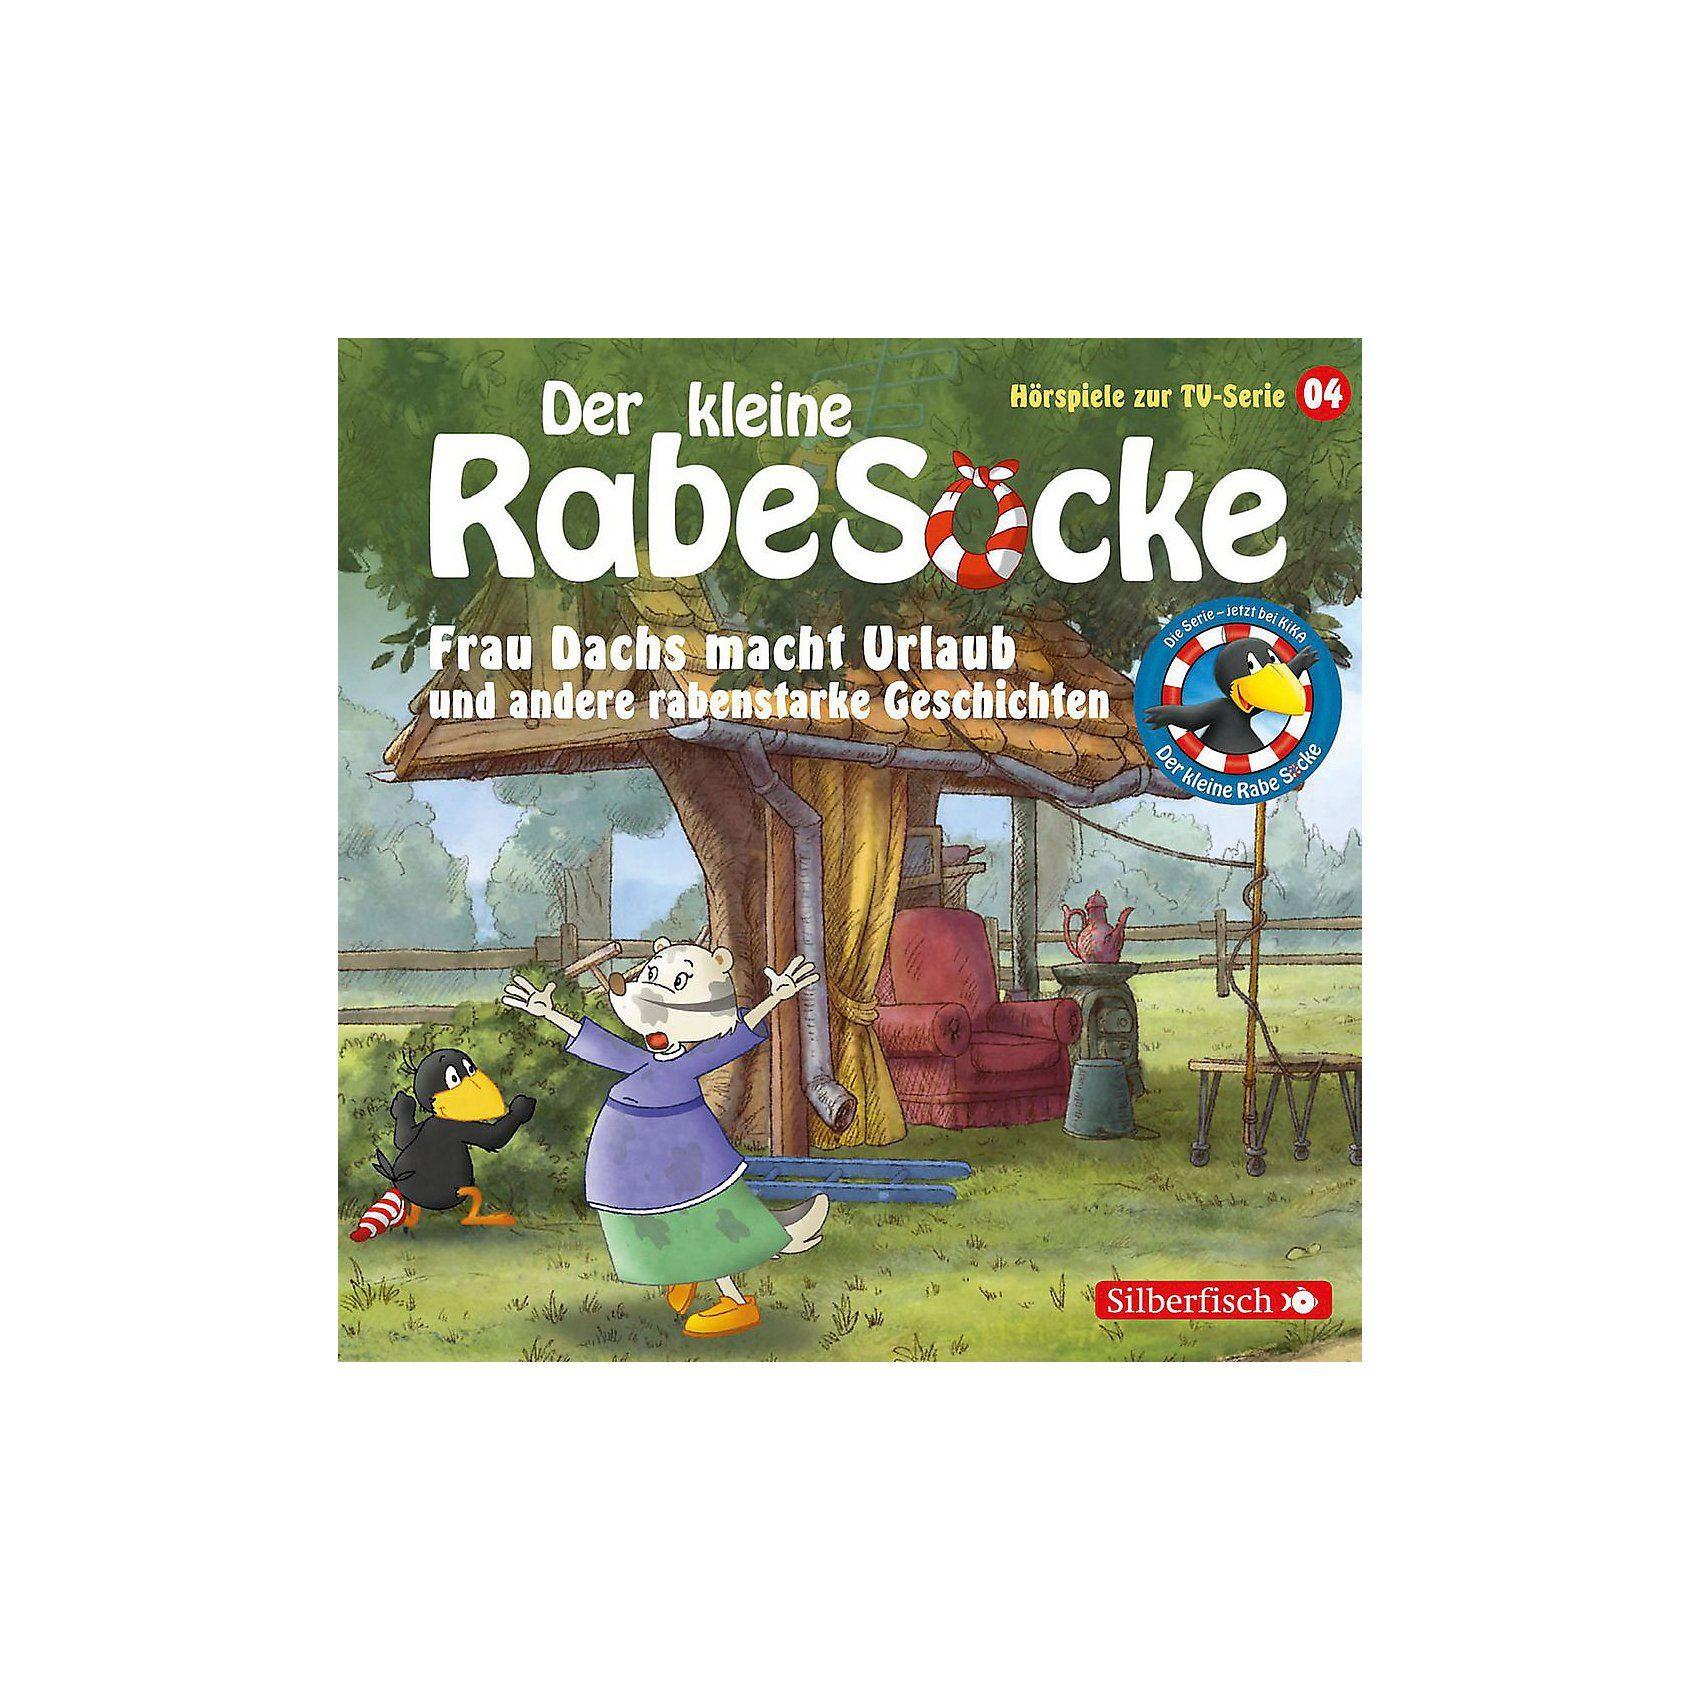 Universal CD Der kleine Rabe Socke 04: Frau Dachs macht Urlaub (Hörspi